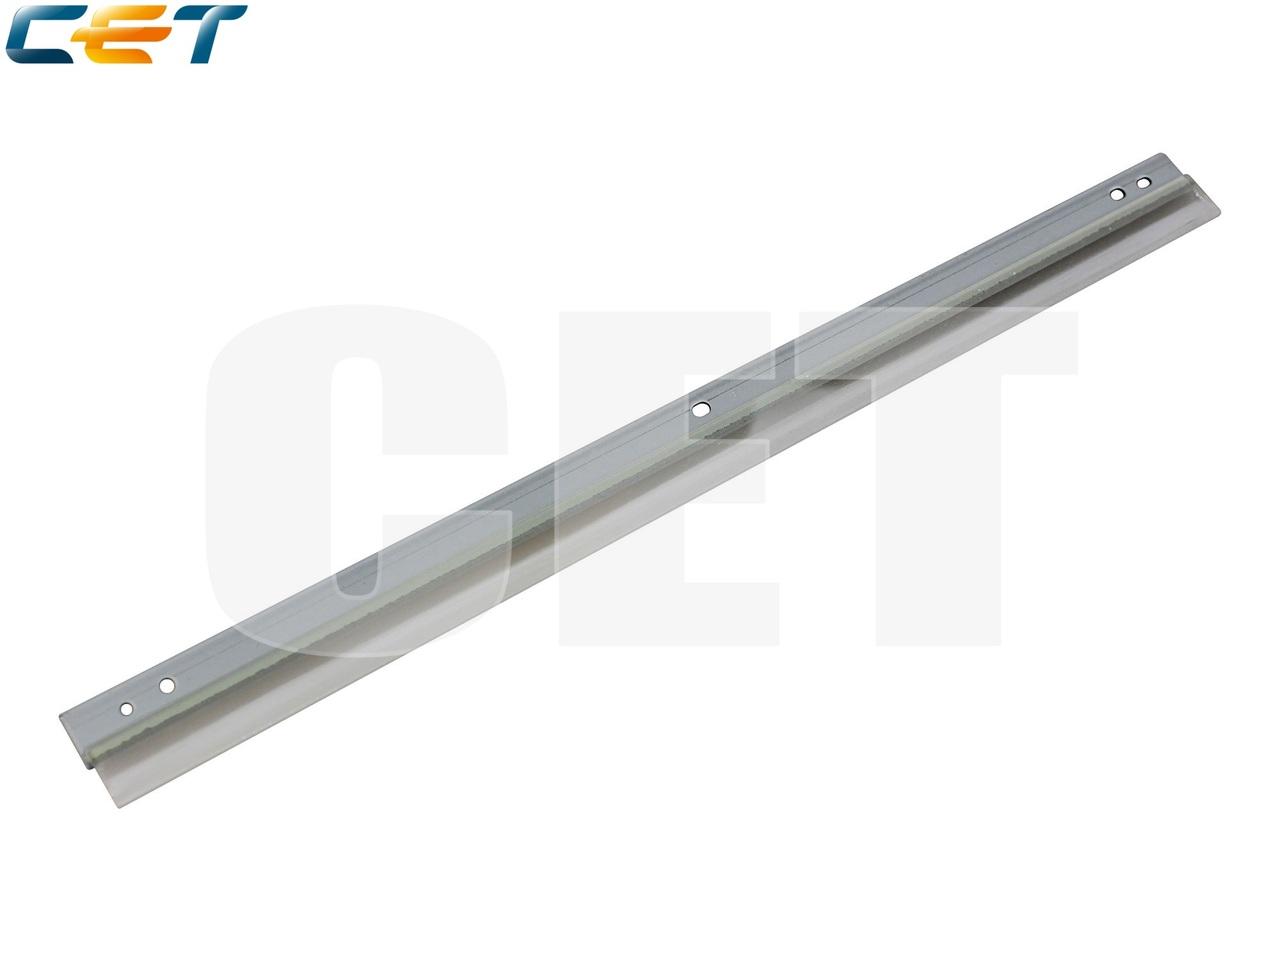 Ракель для KYOCERA TASKalfa 3050ci/3051ci/3551ci/4551ci,TASKalfa 3500i/4500i/5500i (CET), CET7810